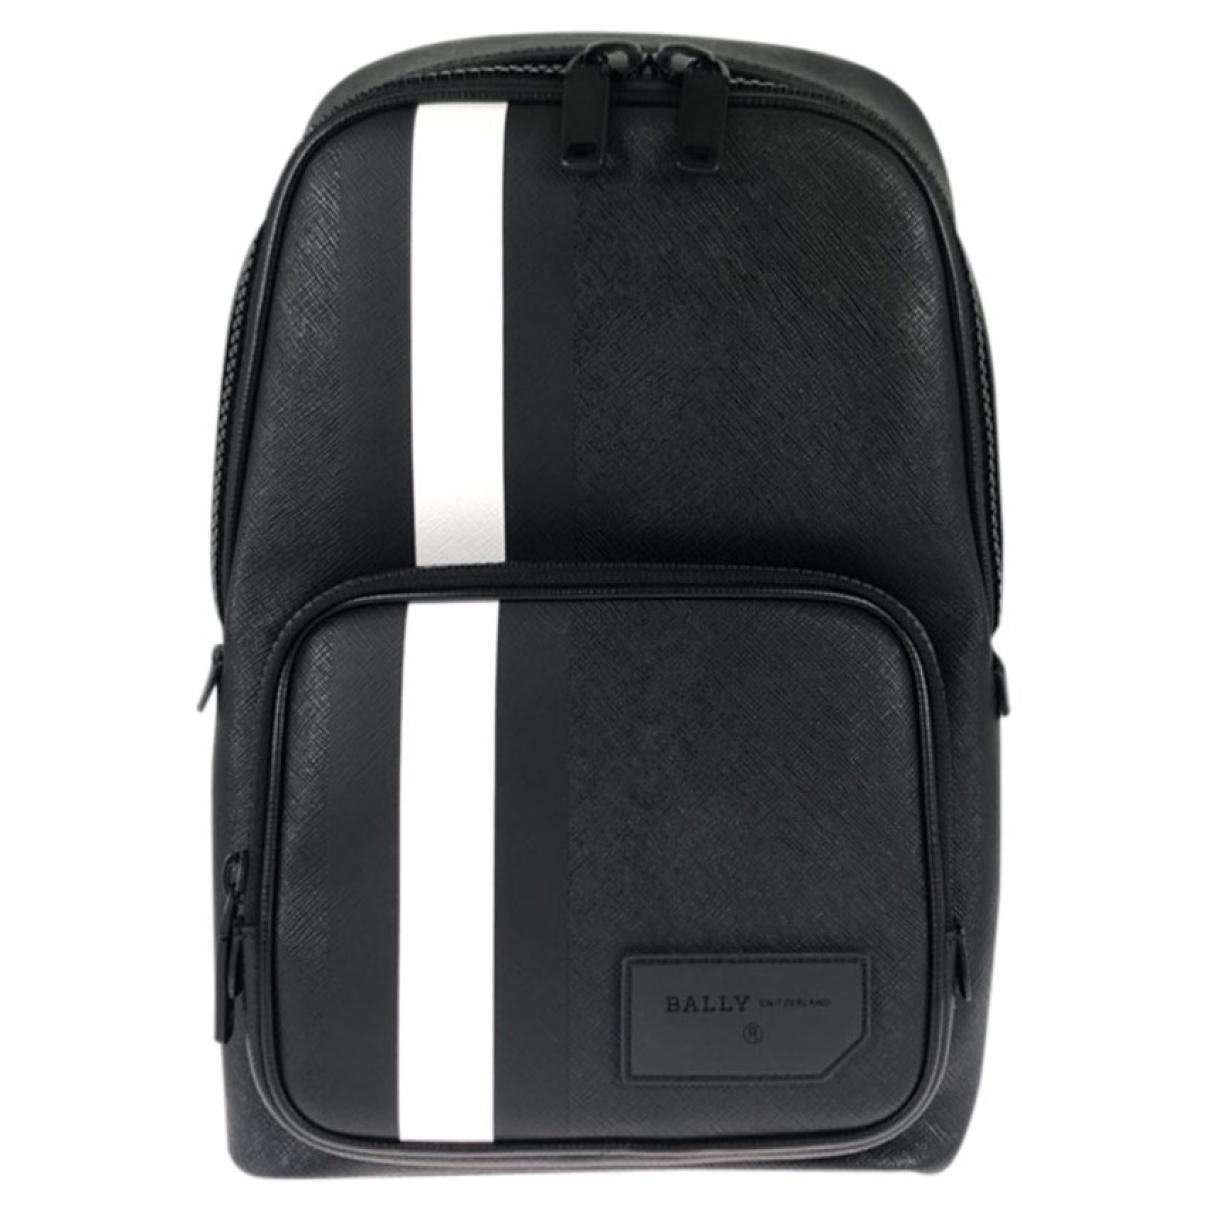 Bally \N Black Cloth bag for Men \N